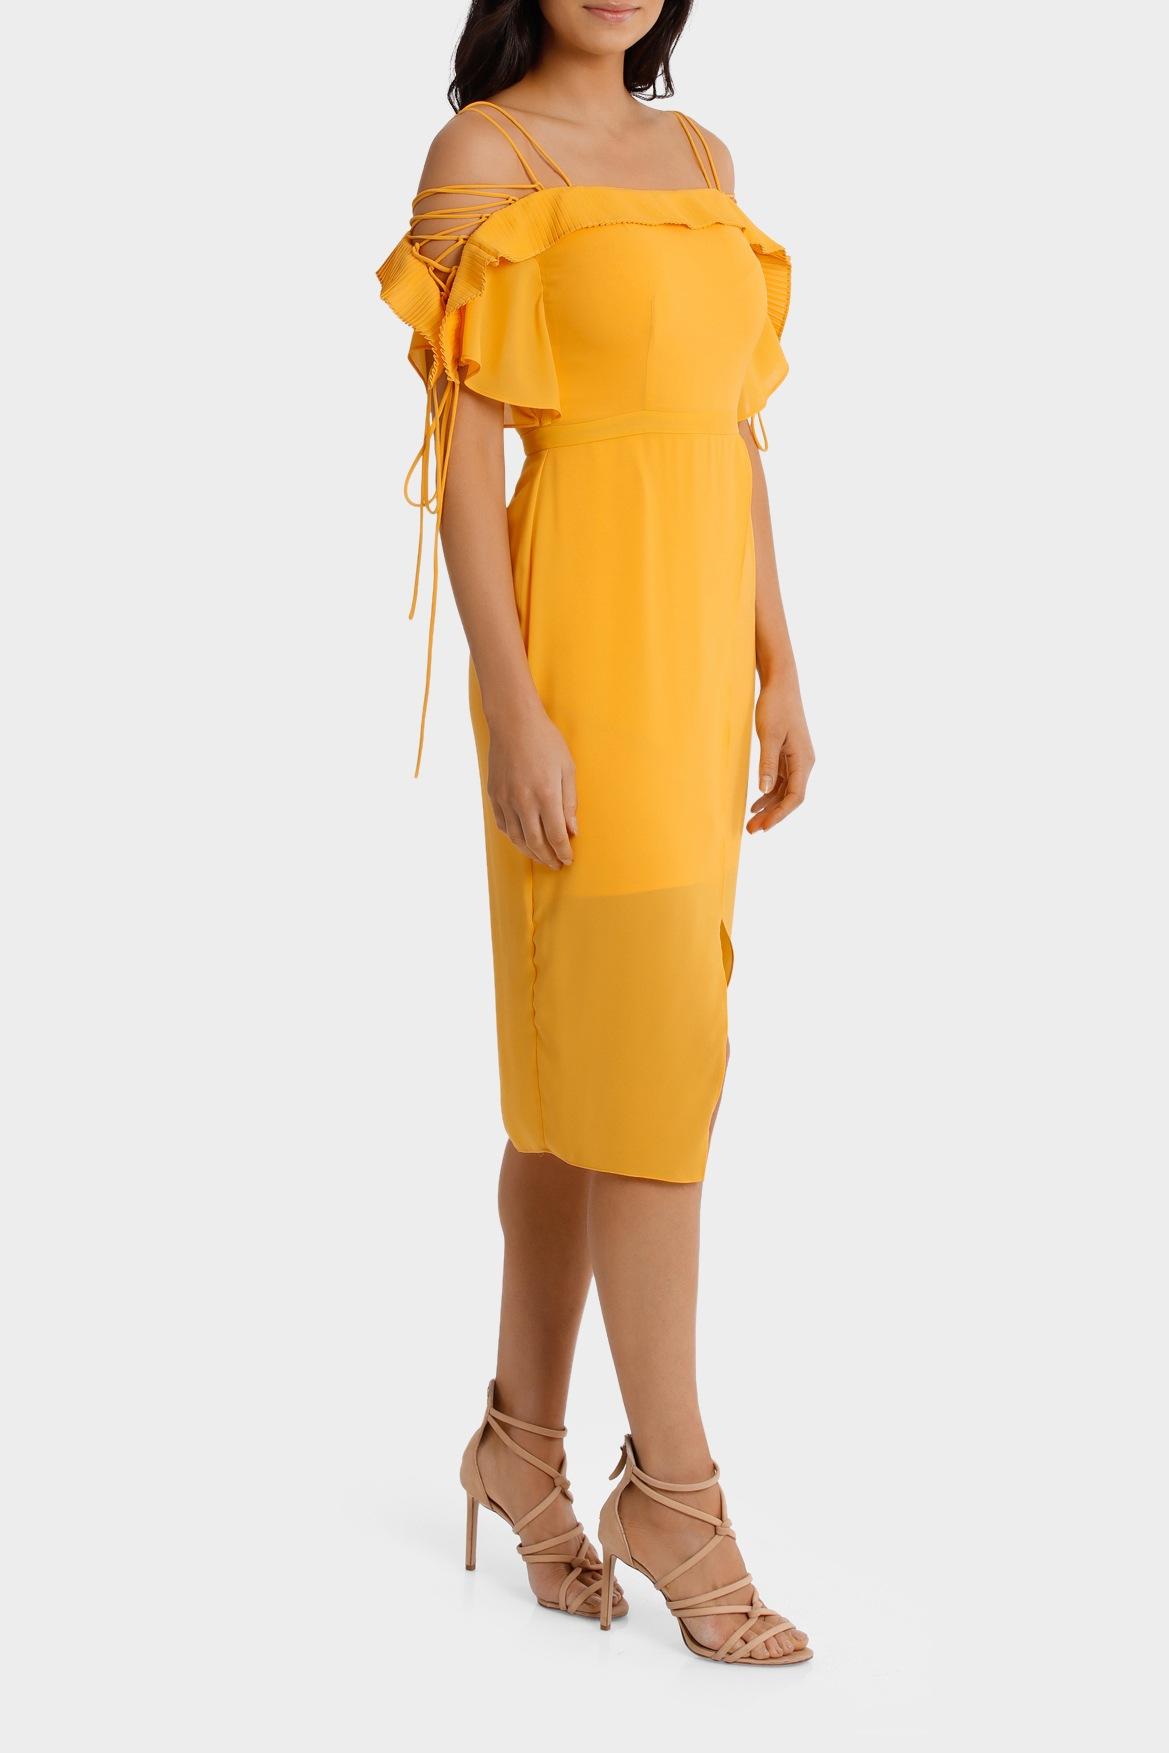 Wayne cooper yellow dress myer